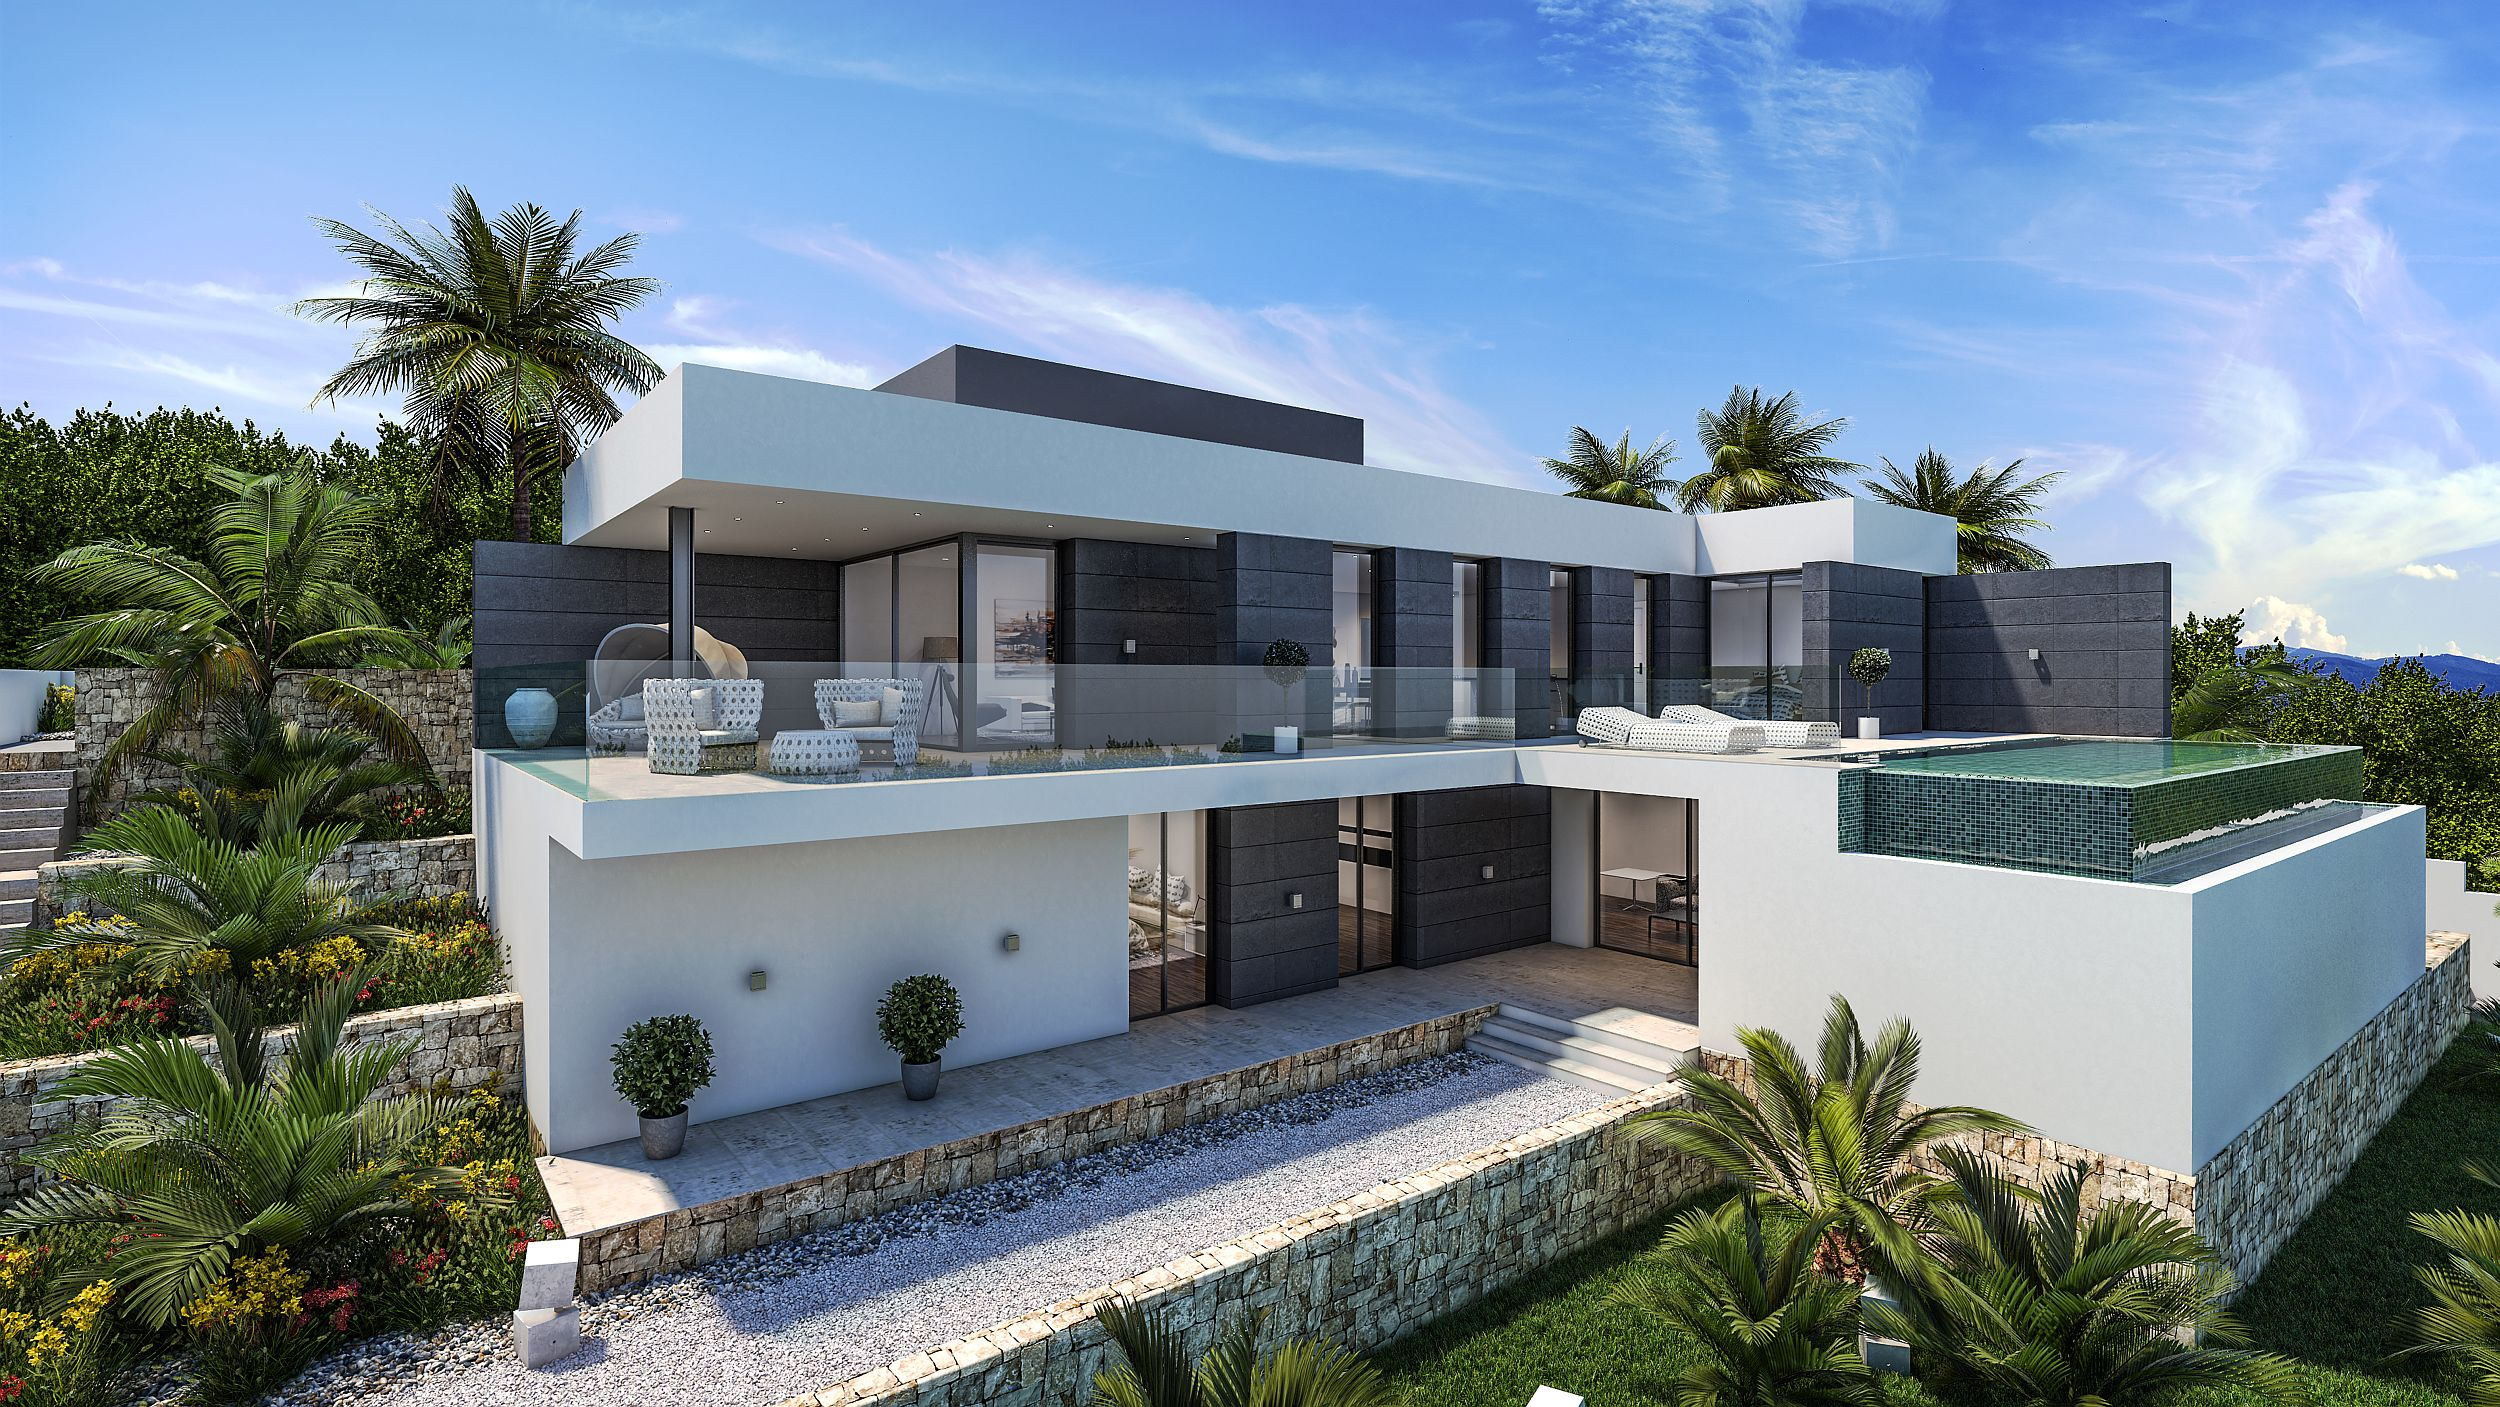 Villa arpeggio royal residence lifestyle